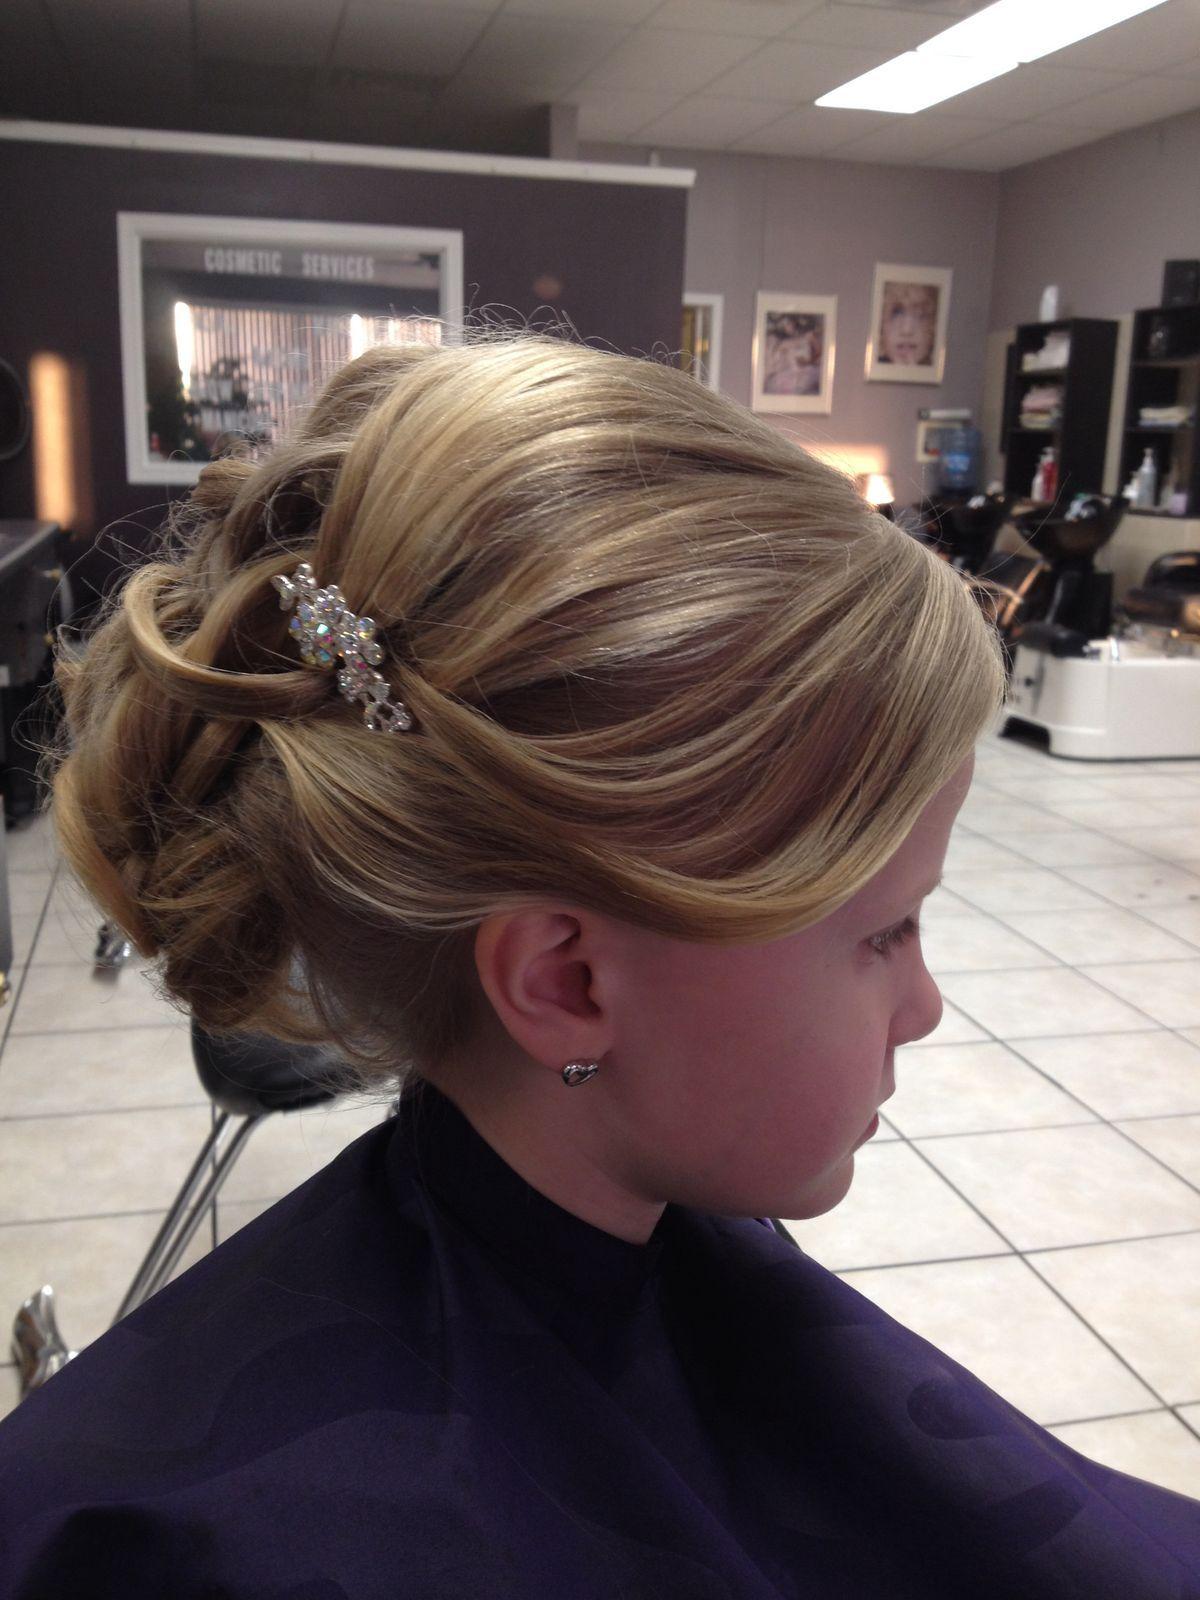 648ca2c1fb7e202096a0102f07178a22 Jpg 1 200 1 600 Pixels First Communion Hairstyles Communion Hairstyles Hairstyle